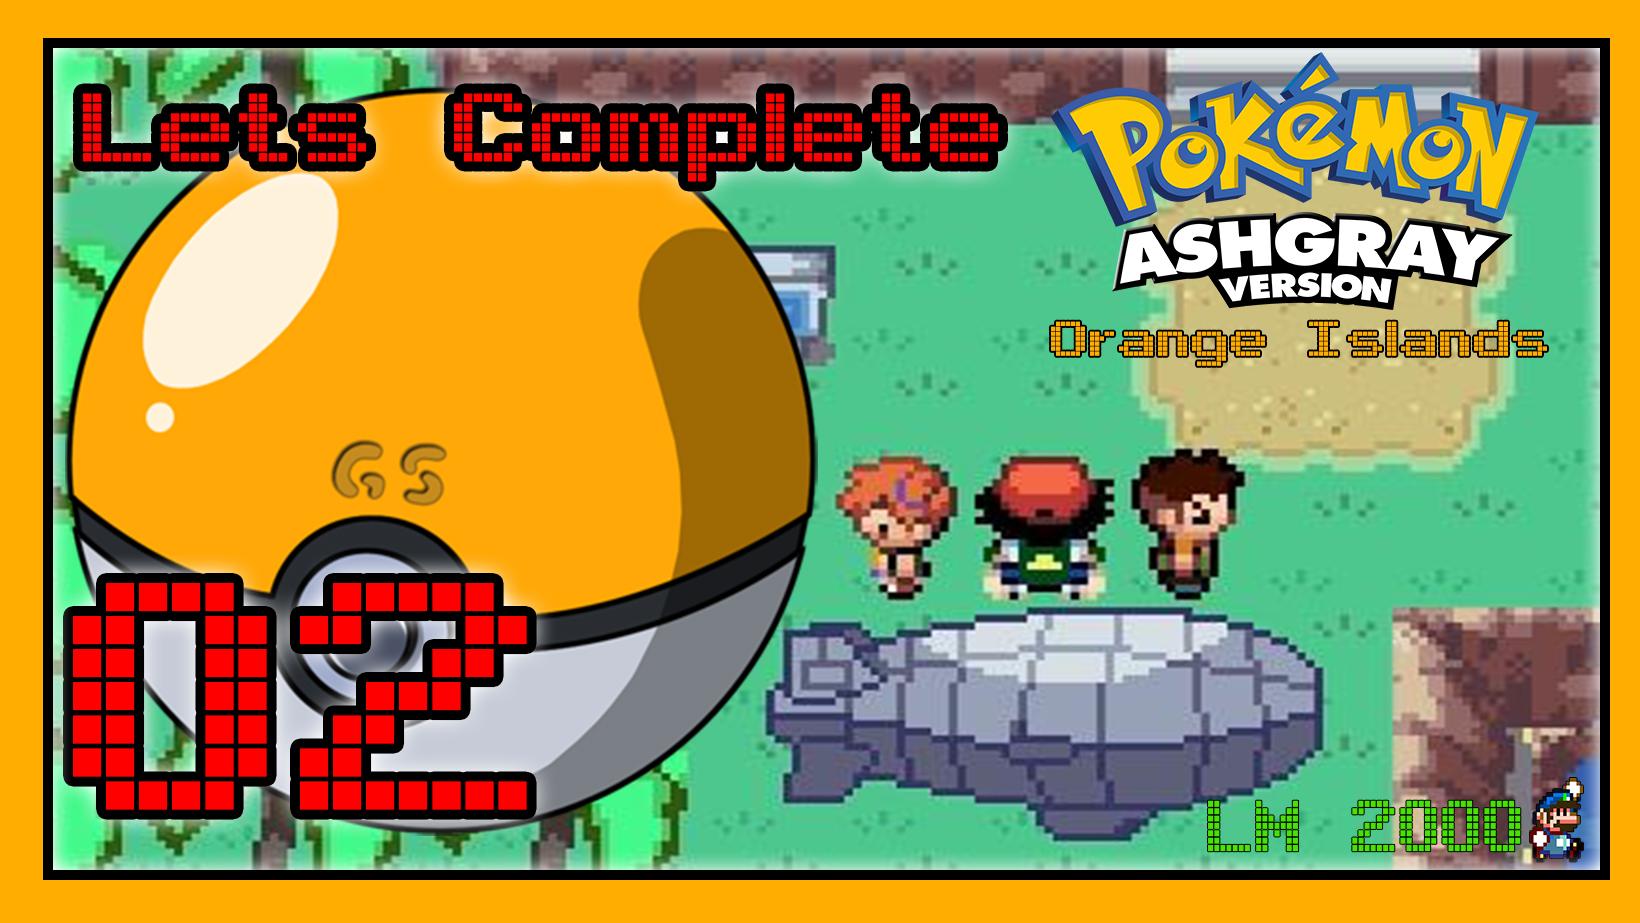 download pokemon ash gray my boy emulator apk